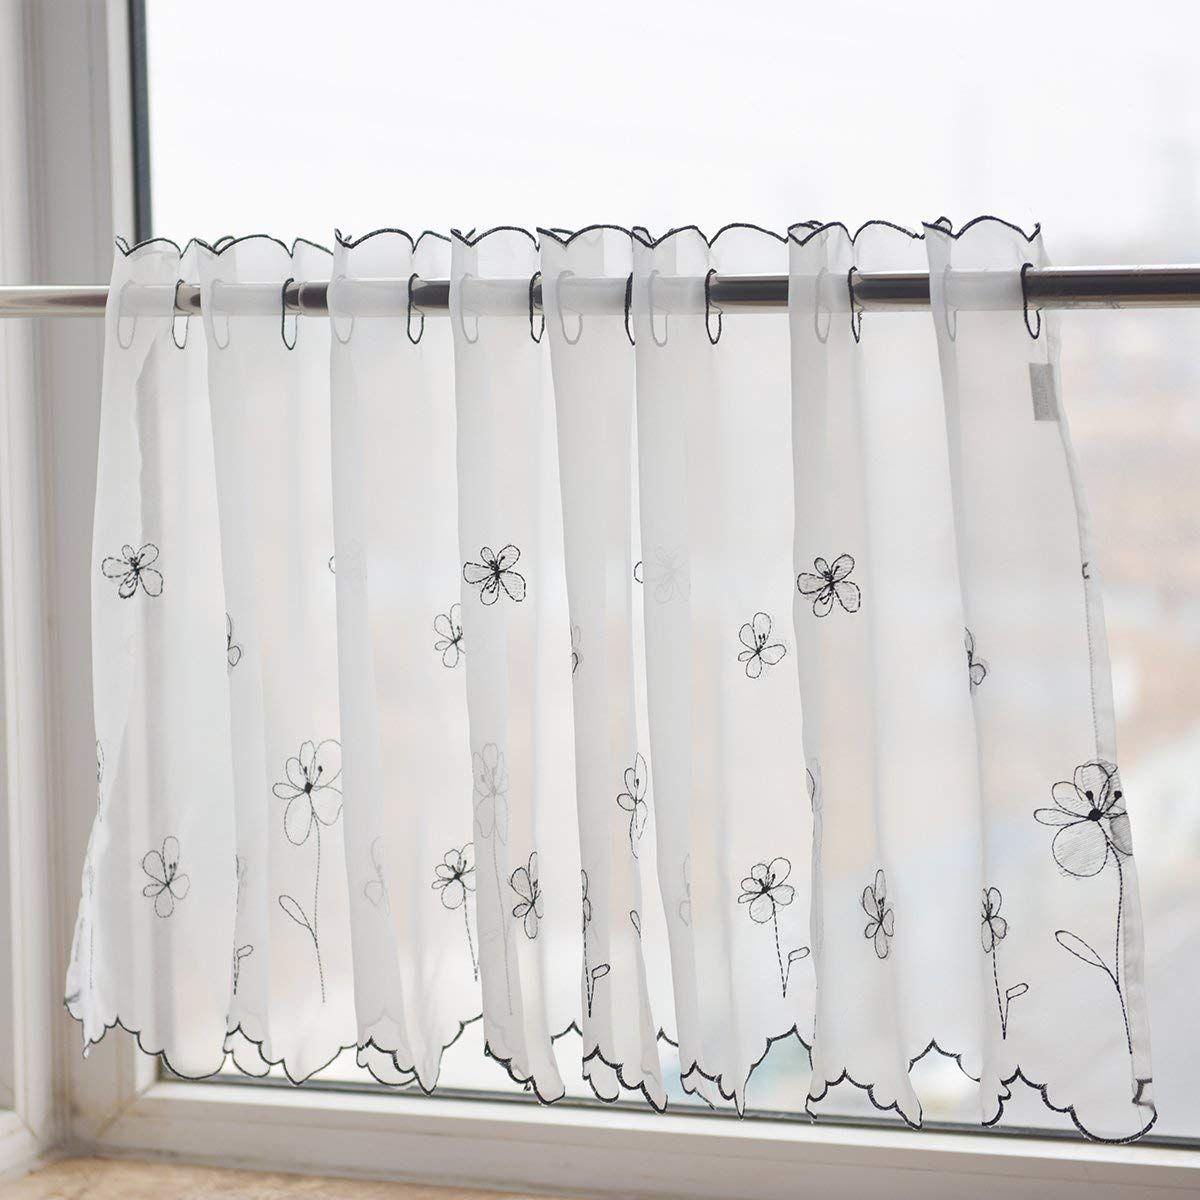 Black flower white semisheer privacy sheers kitchen valance